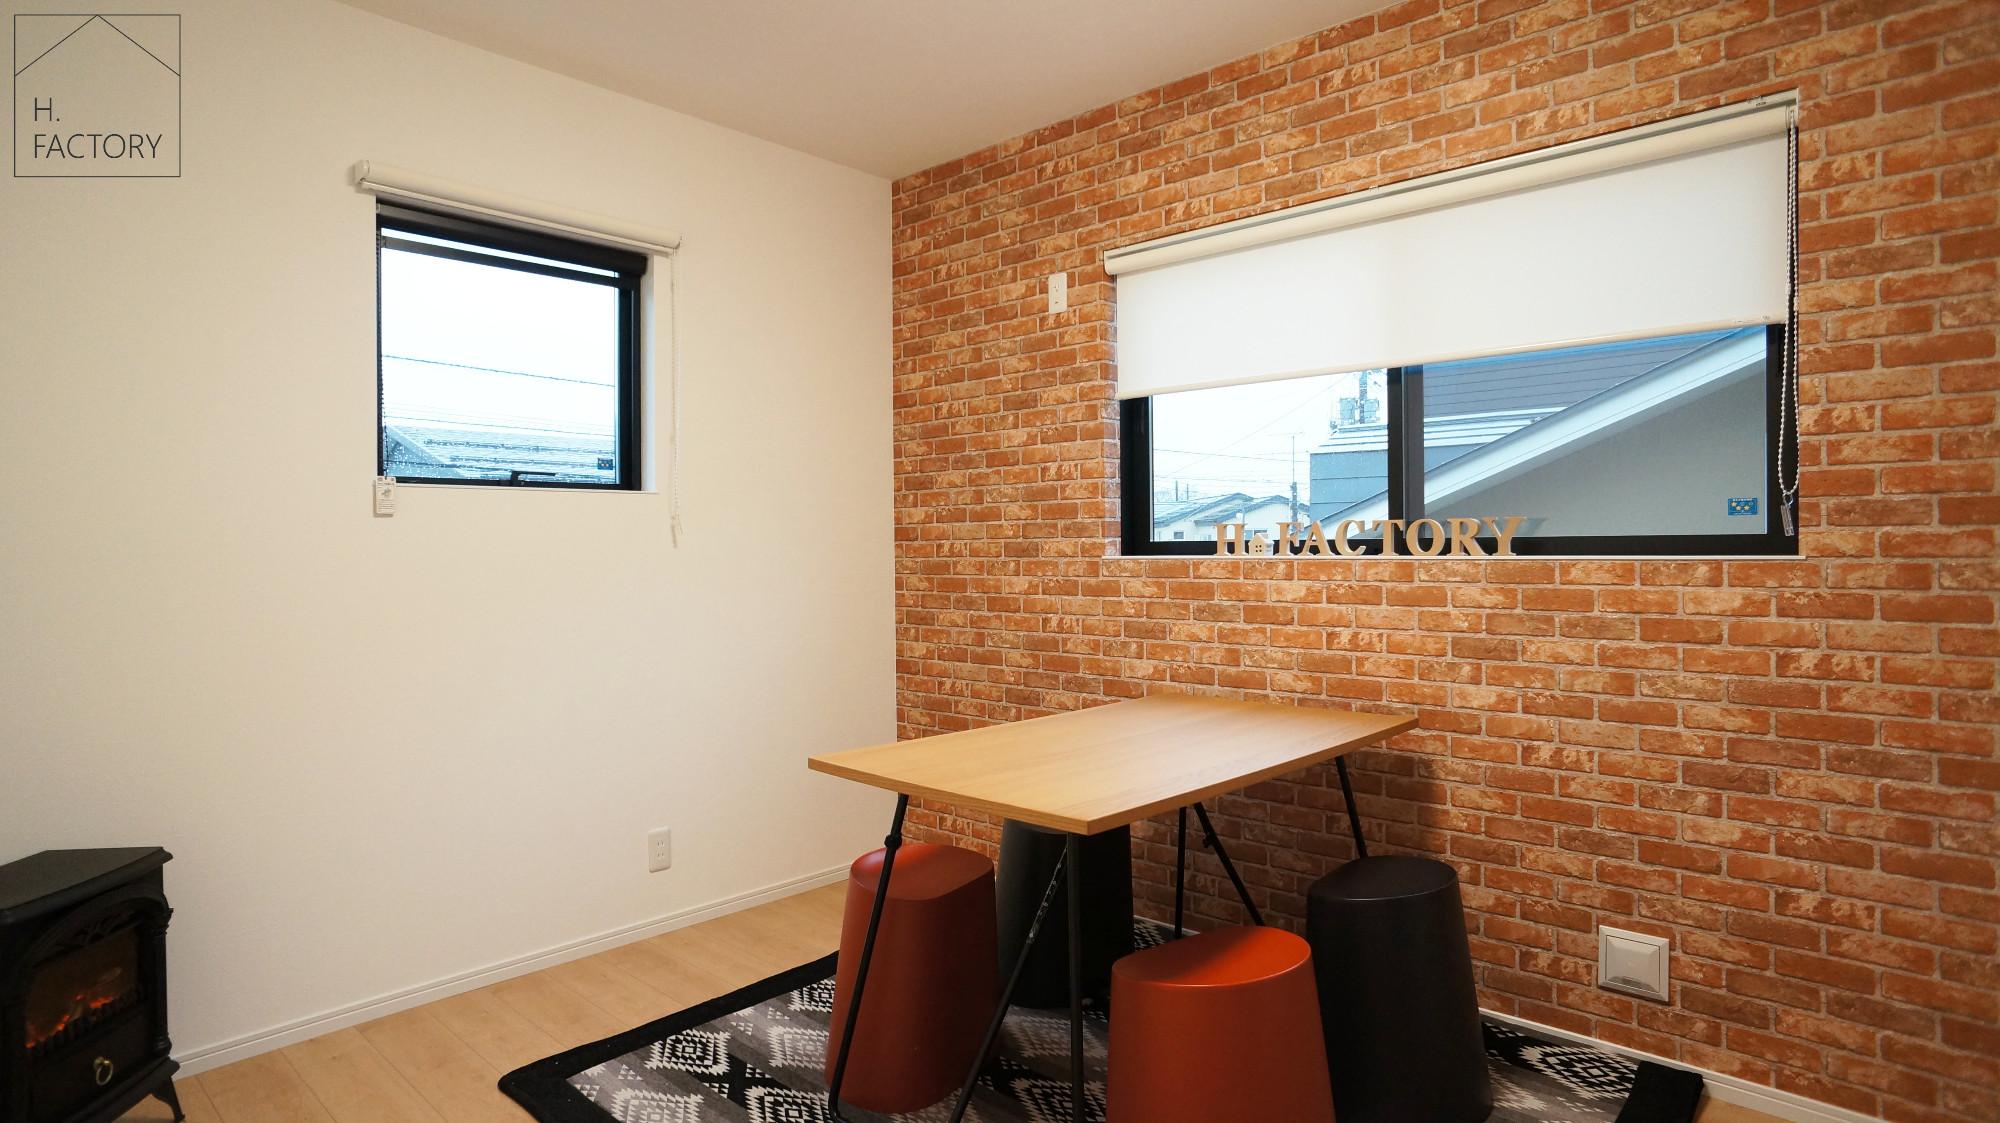 H.FACTORY/株式会社 橋本技建「シンプル&ベーシックなオシャレカフェのような家」のシンプル・ナチュラルな居室の実例写真